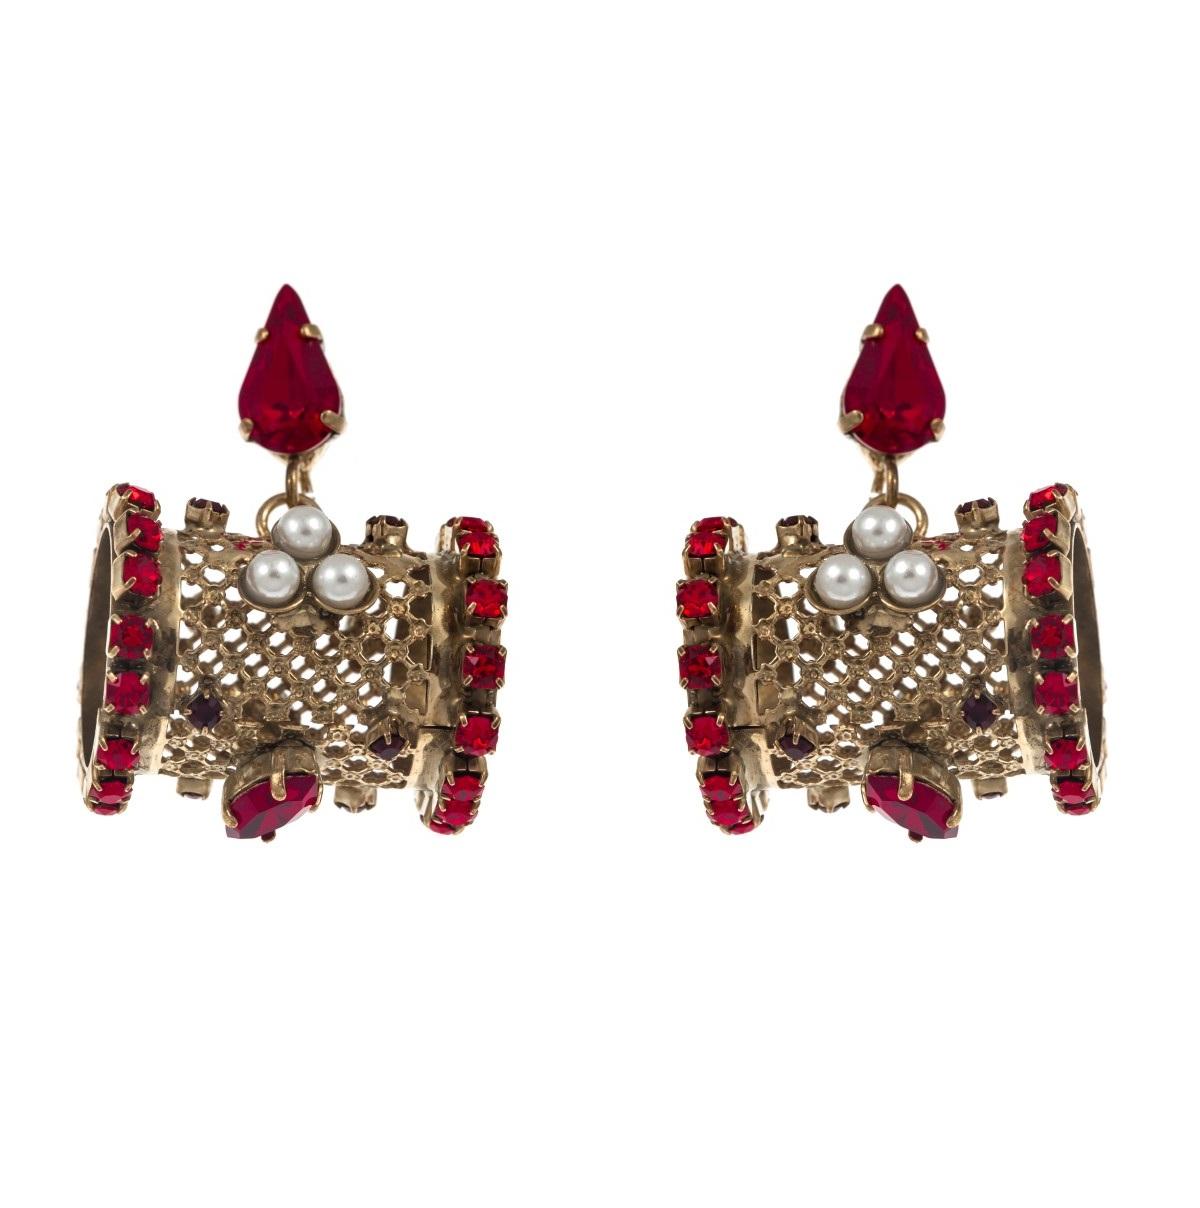 ARTWEAR DIMITRIADIS - Γυναικεία σκουλαρίκια ARTWEAR DIMITRIADIS με στρας & πέρλε γυναικεία αξεσουάρ κοσμήματα σκουλαρίκια